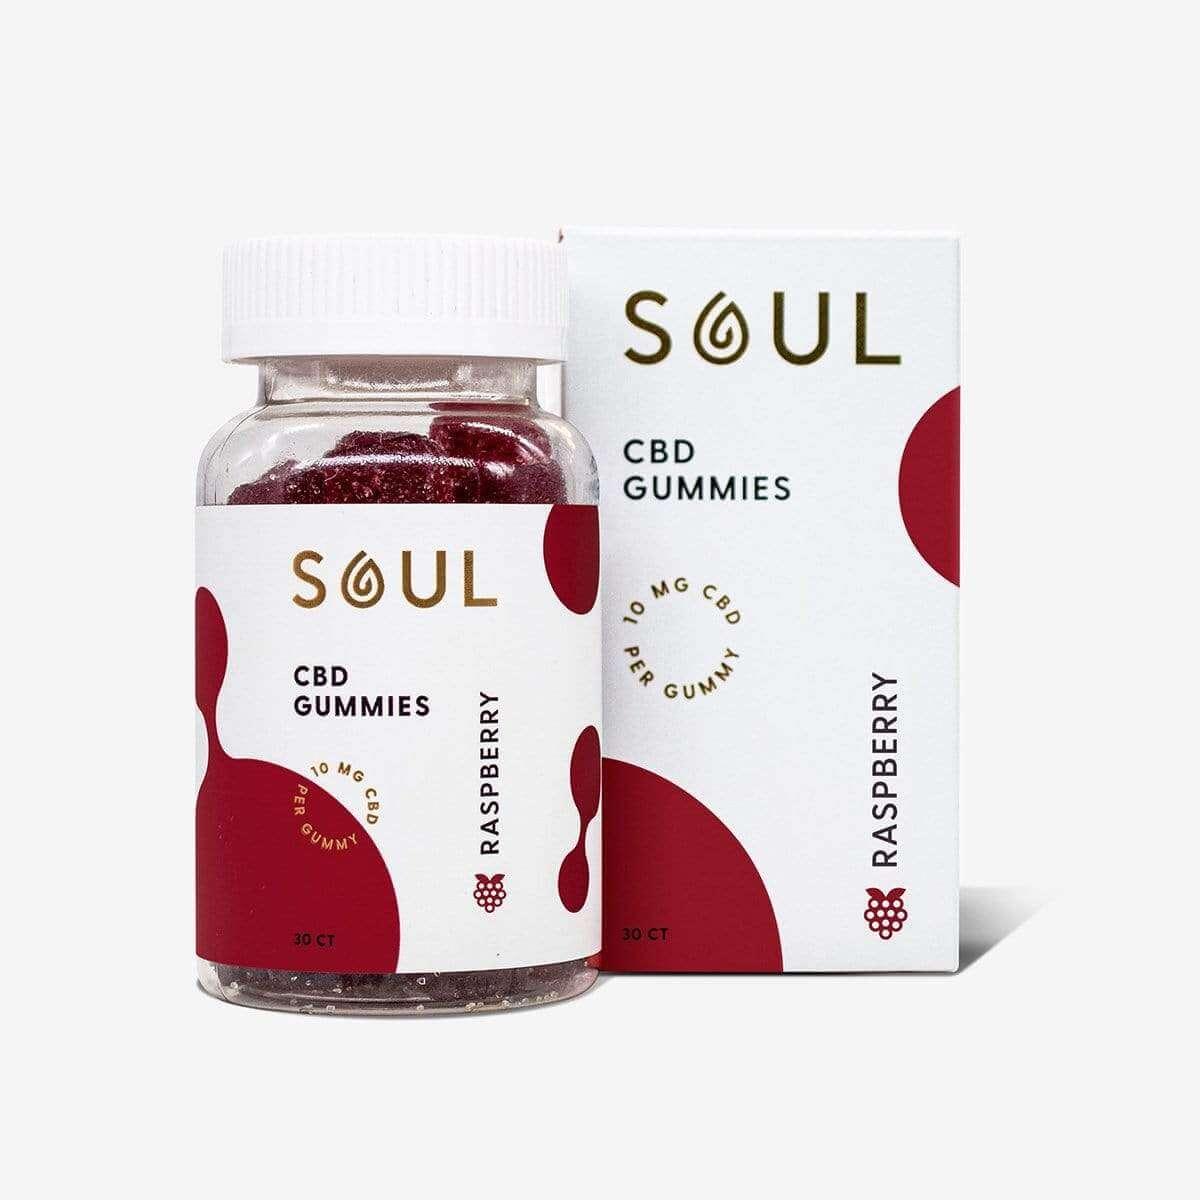 Buy Soul CBD Oil Drops | CBD Gummies | CBD Capsules | CBD Cream | CBD for Pets | CBD Bath Bombs | CBD Bundles | CBD Gift Card